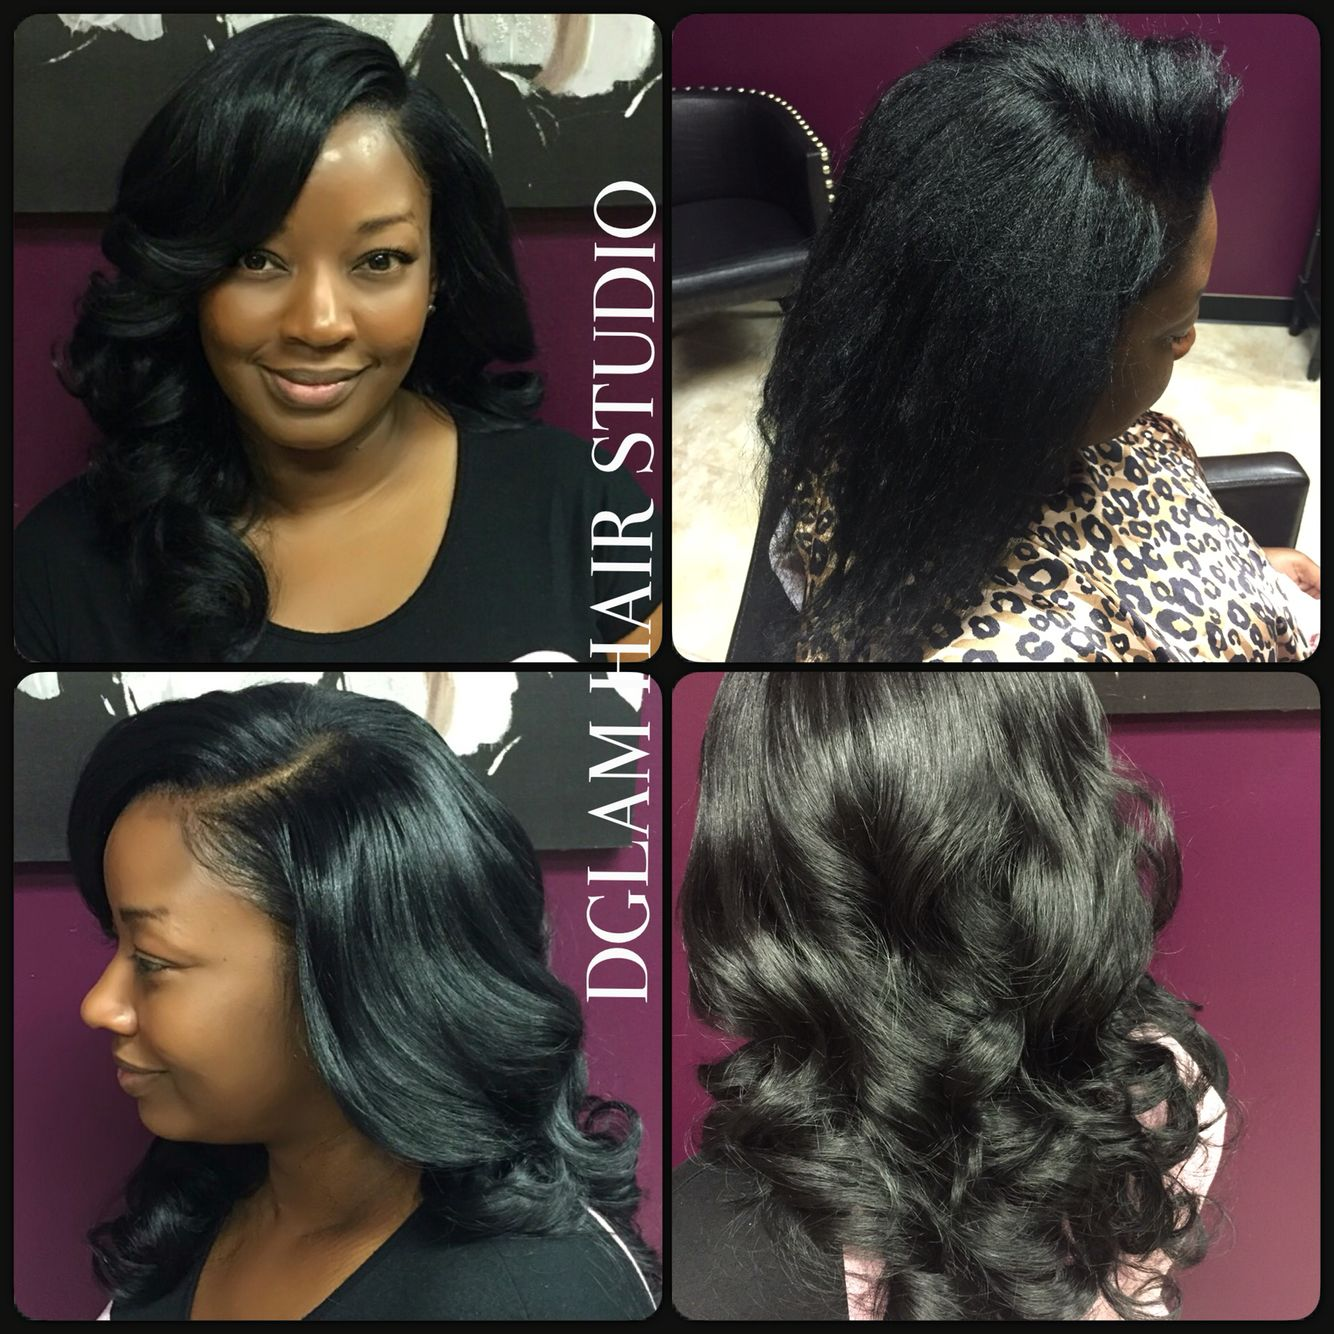 Full Sewin Weave Body Curls Body Waves Long Hair Houston Hair Salon Houston Hairstylist Dglamhairst Natural Hair Styles Hair Studio Long Hair Styles